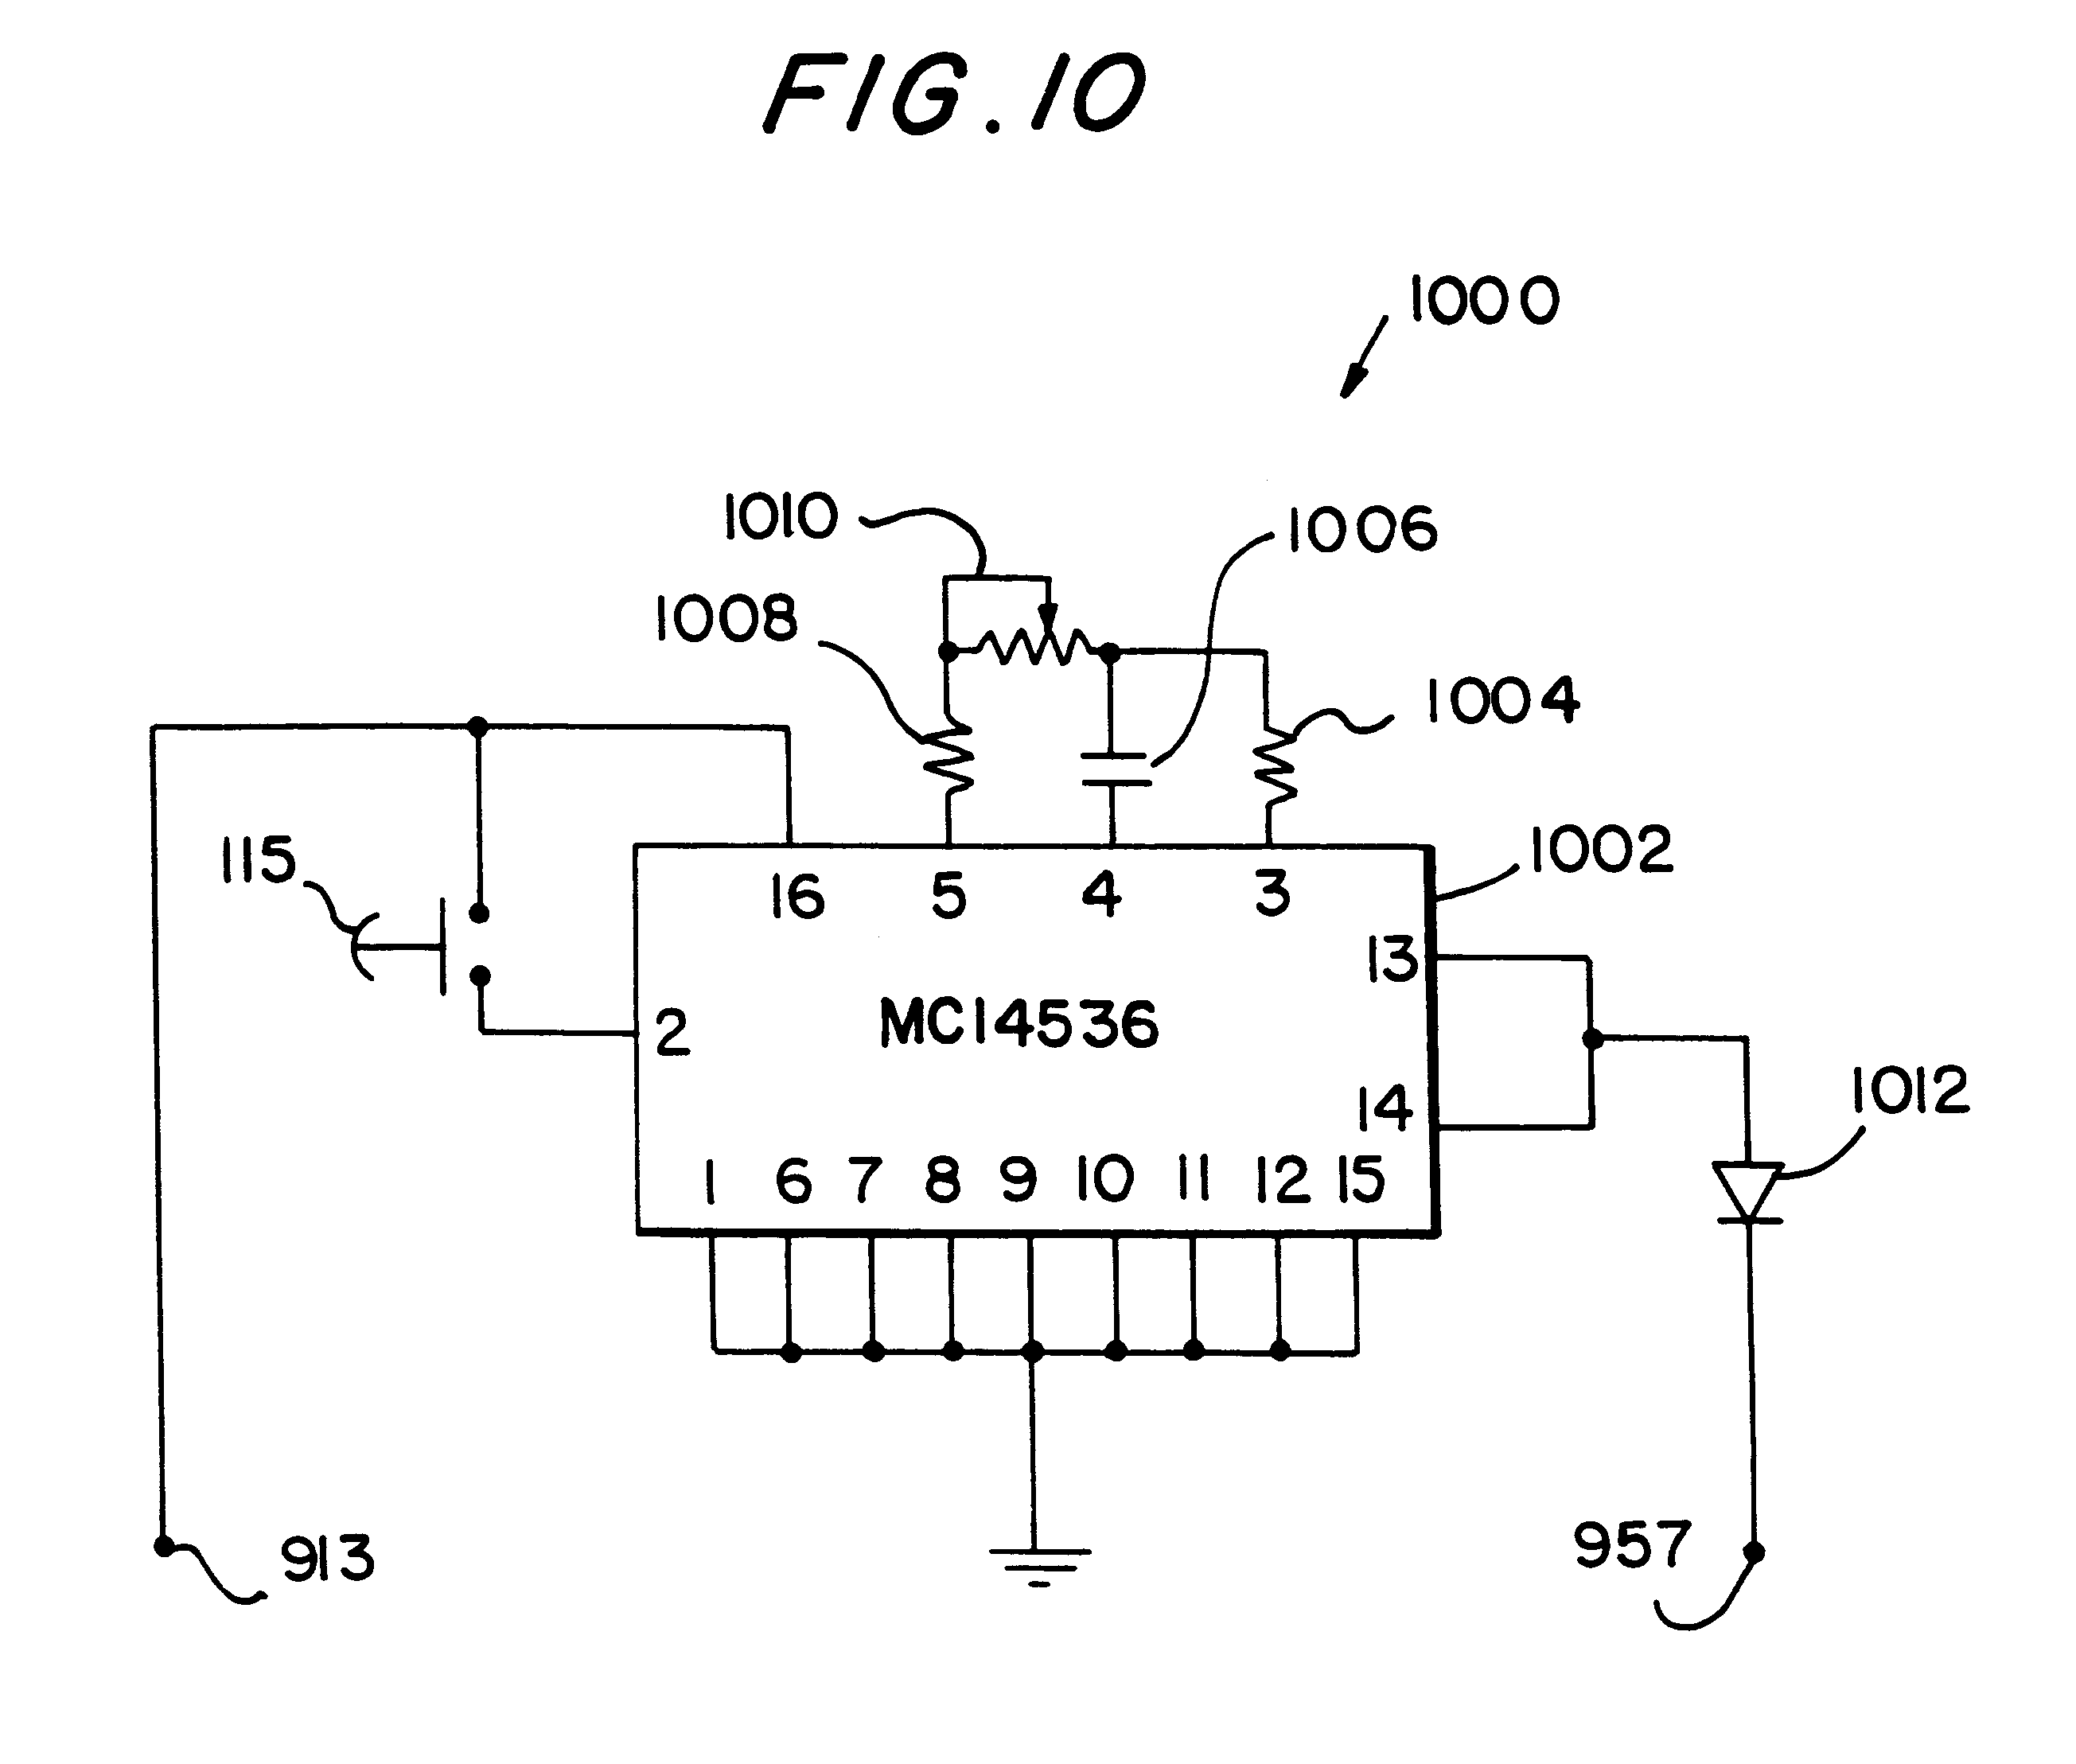 patent us6215398 occupancy sensors for long range sensing within